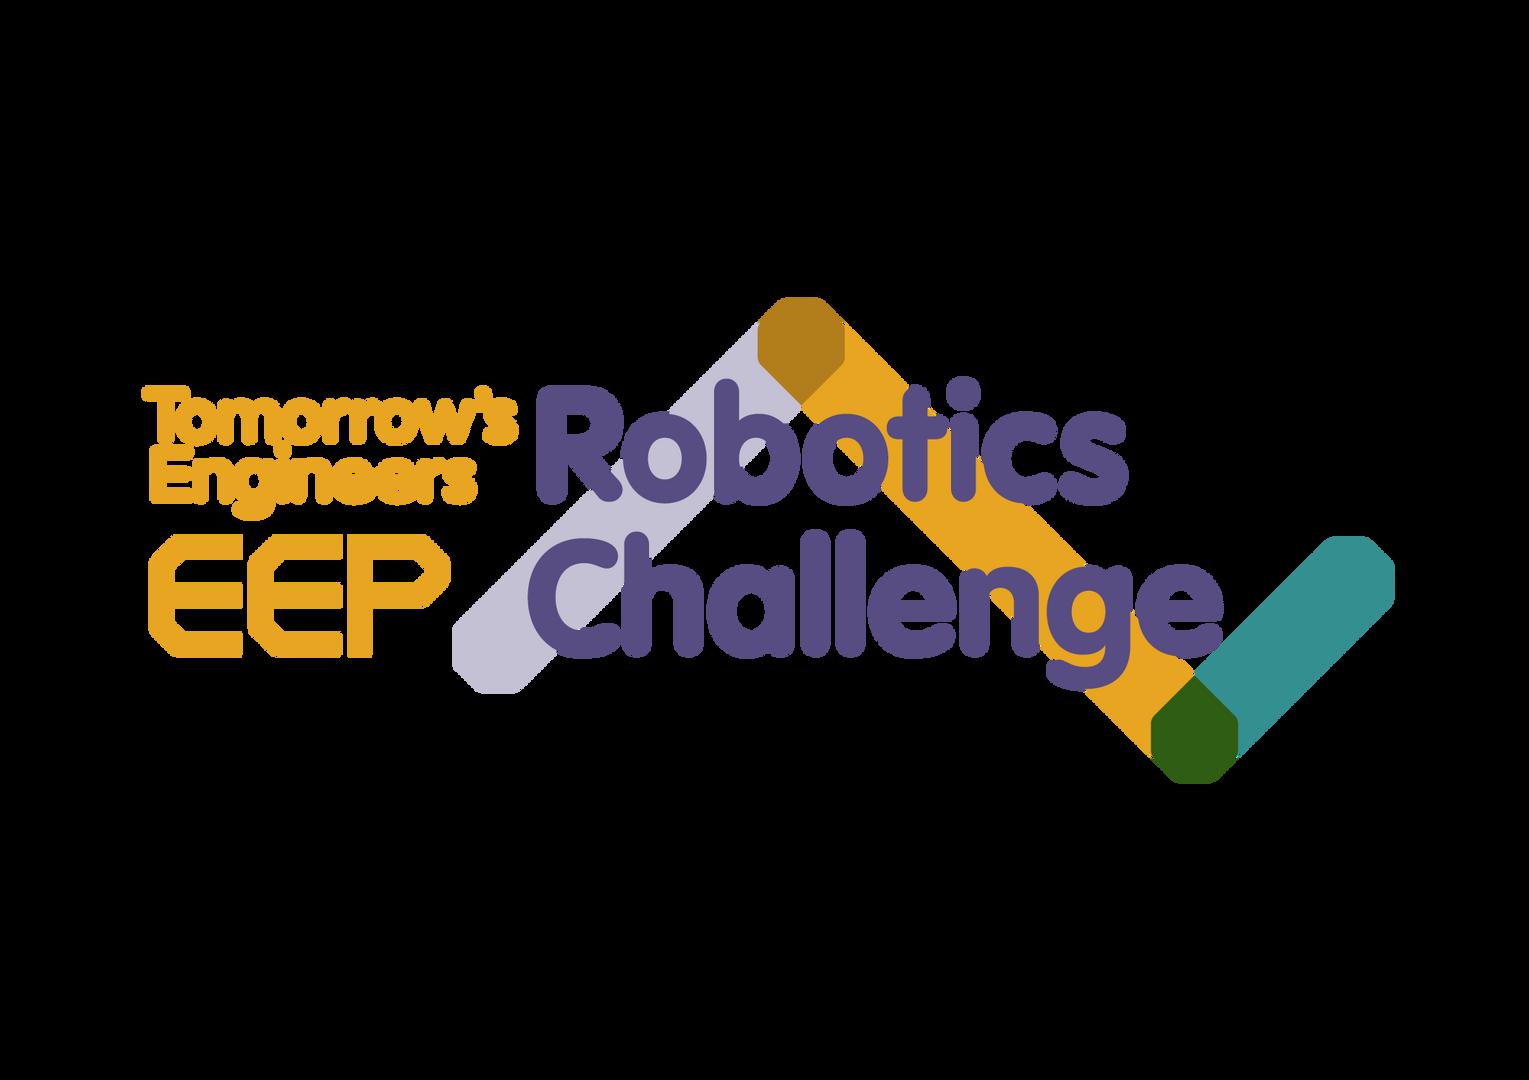 ROBOTICS_CHALLENGE_LOGO_RGB.png